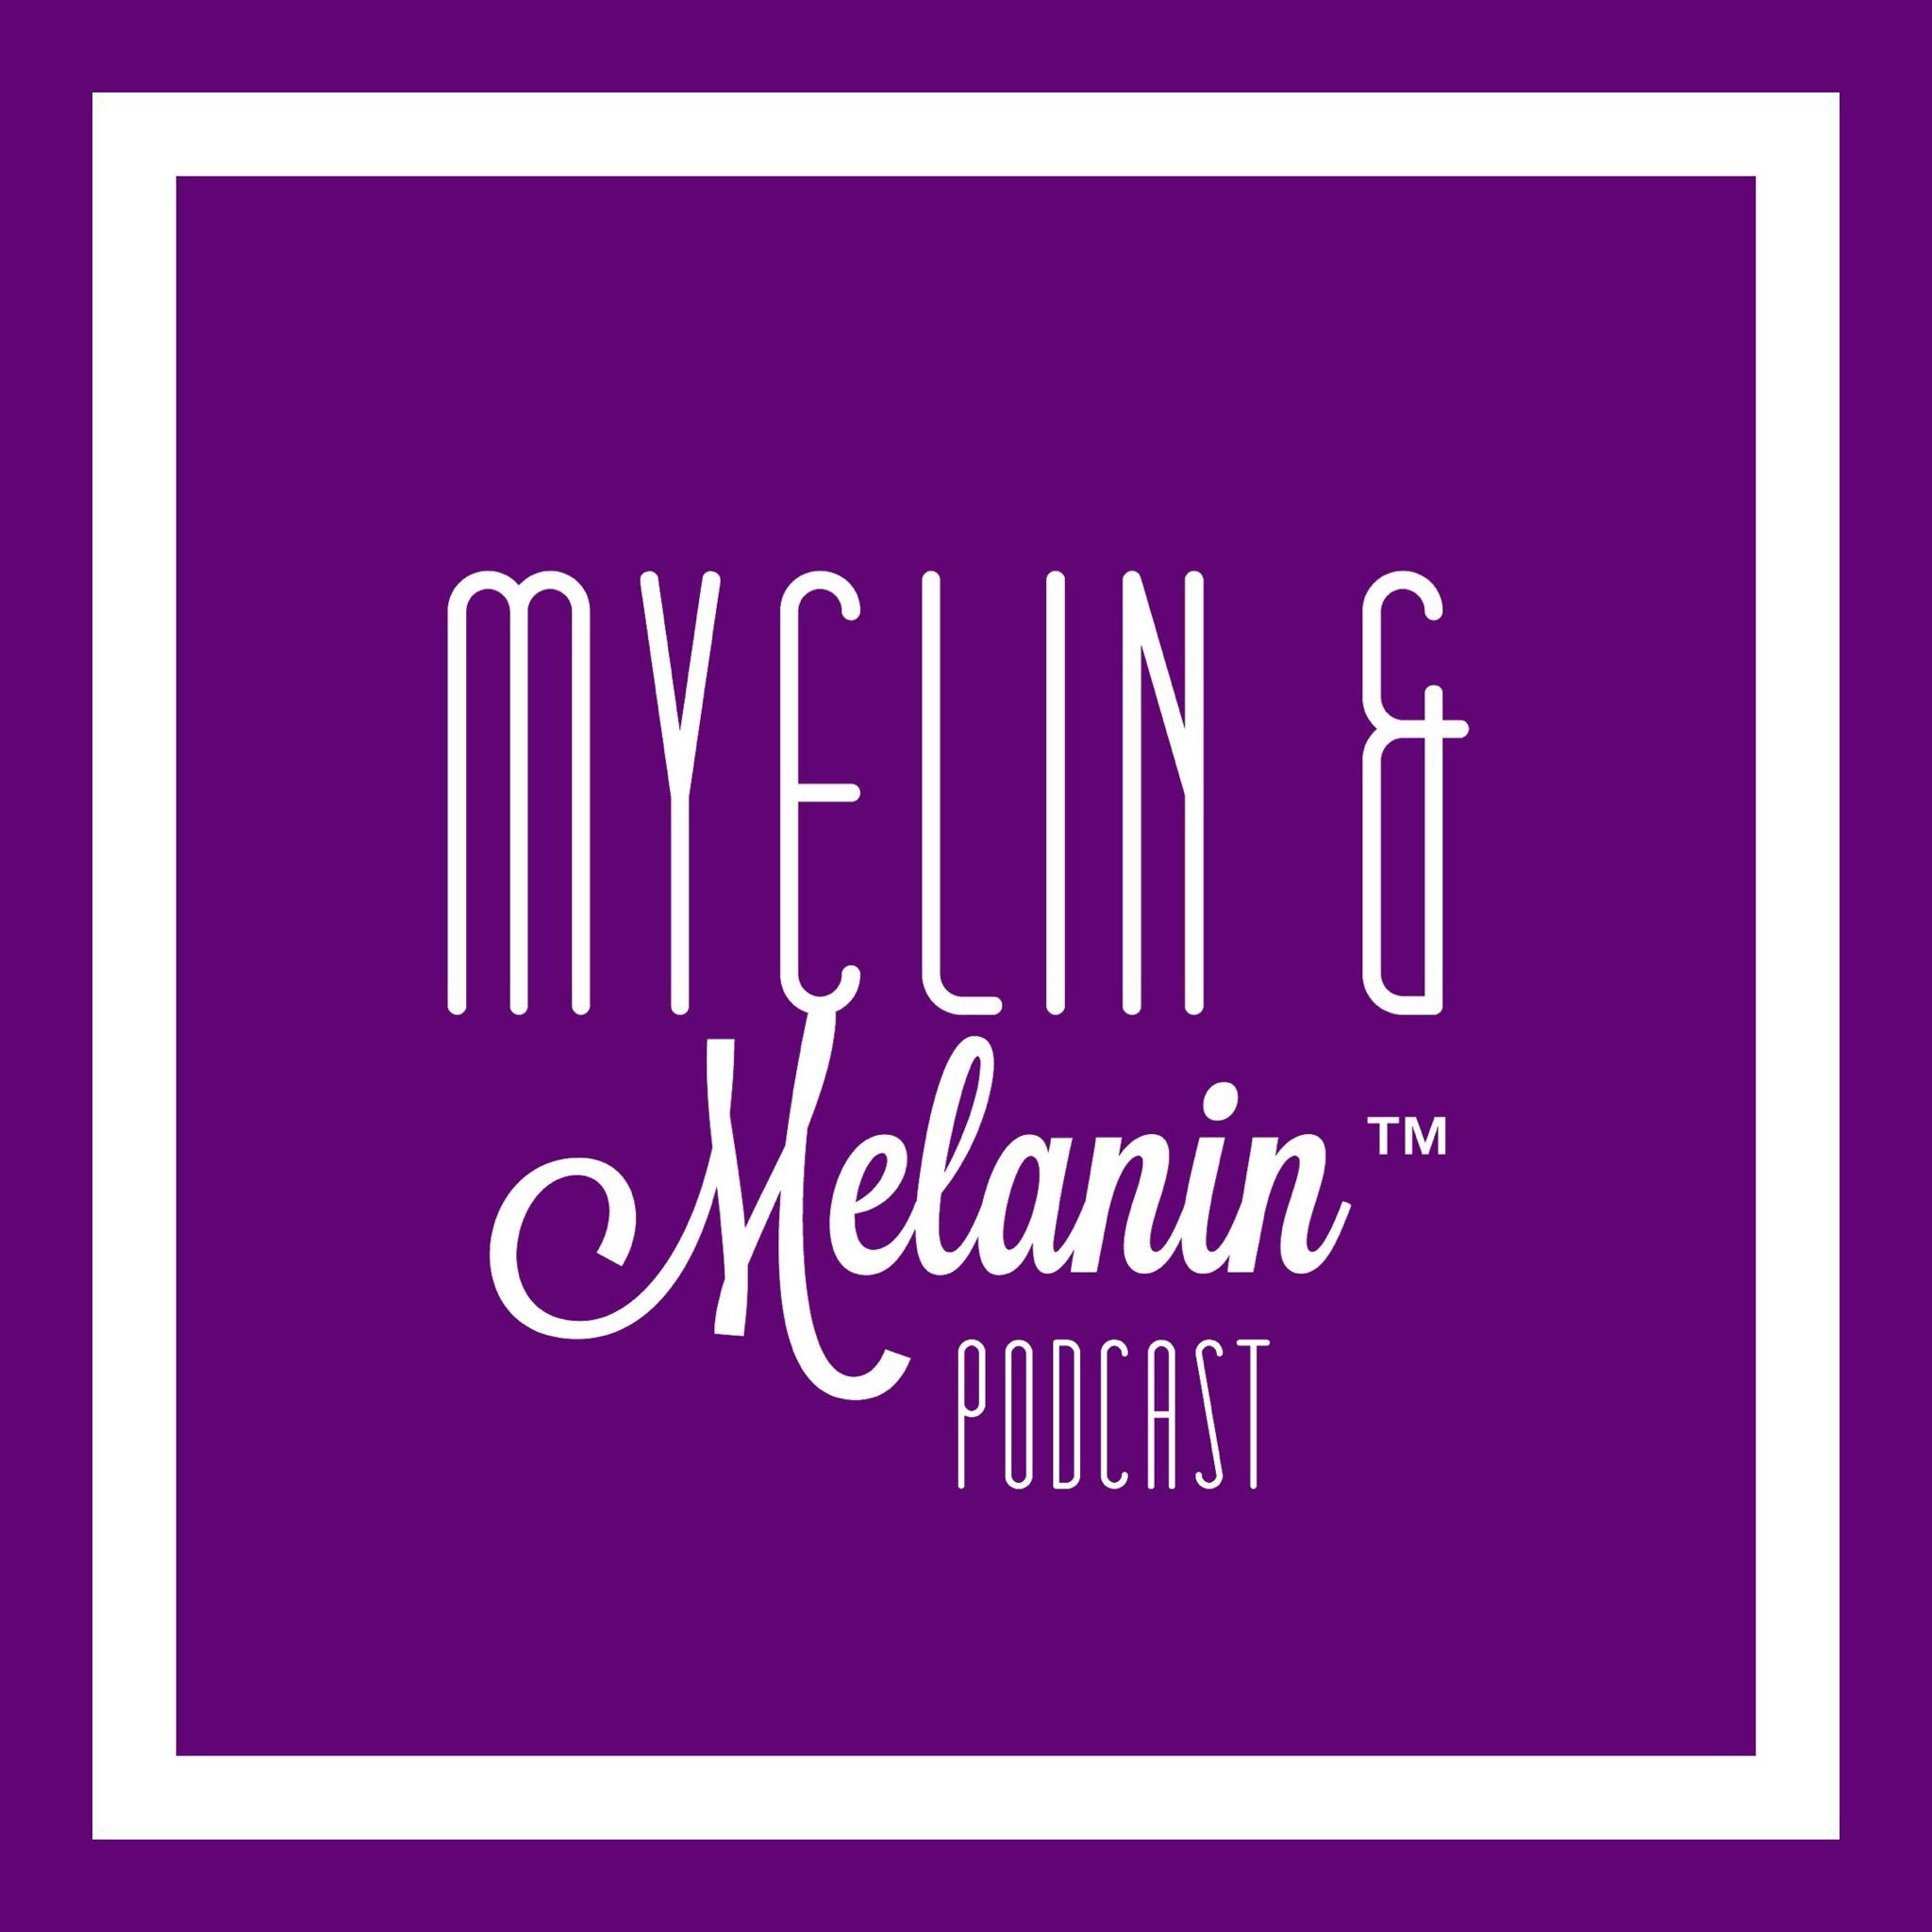 Myelin & Melanin™ Podcast show art